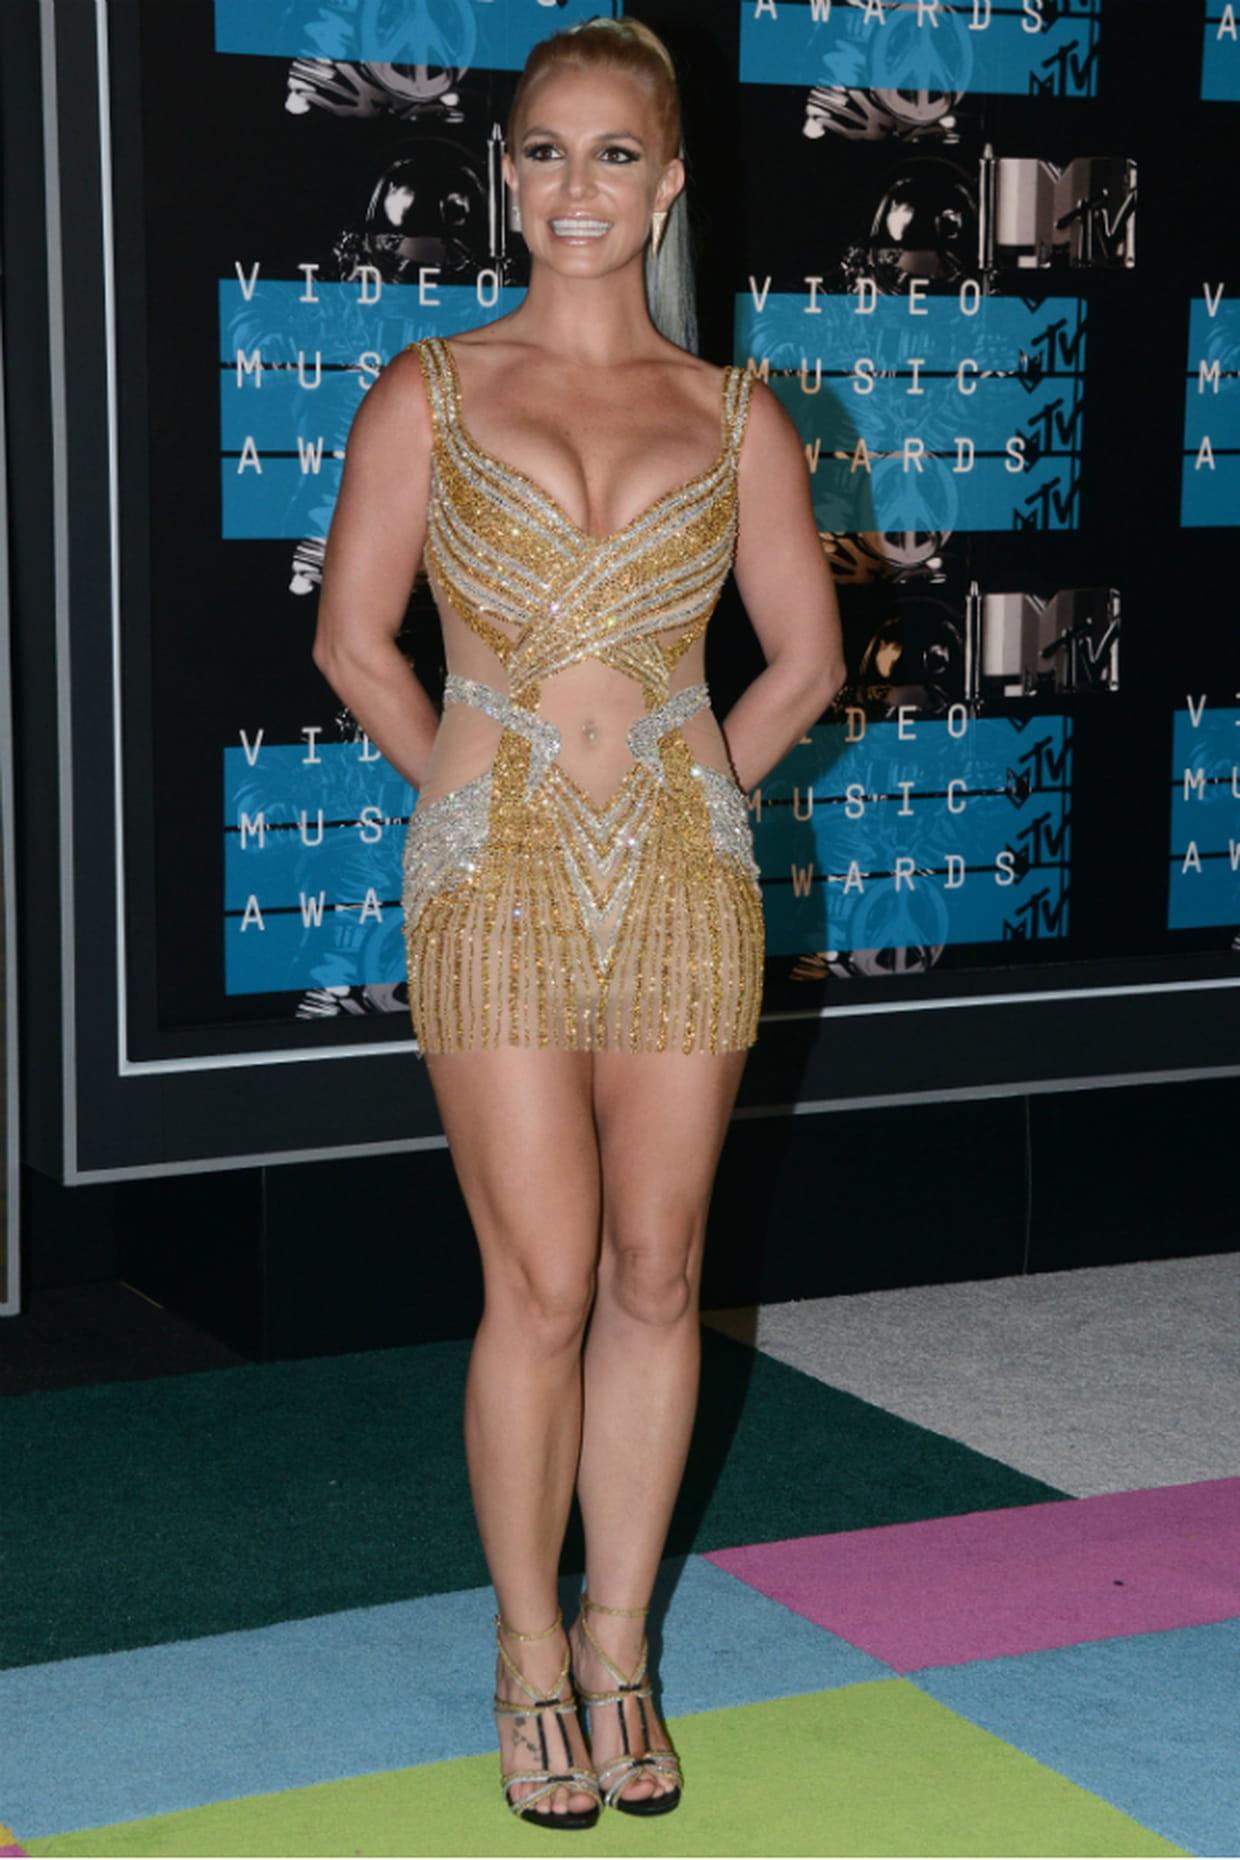 Britney Spears Robe Mini Spears Robe Britney Mini En En fYv6yb7g